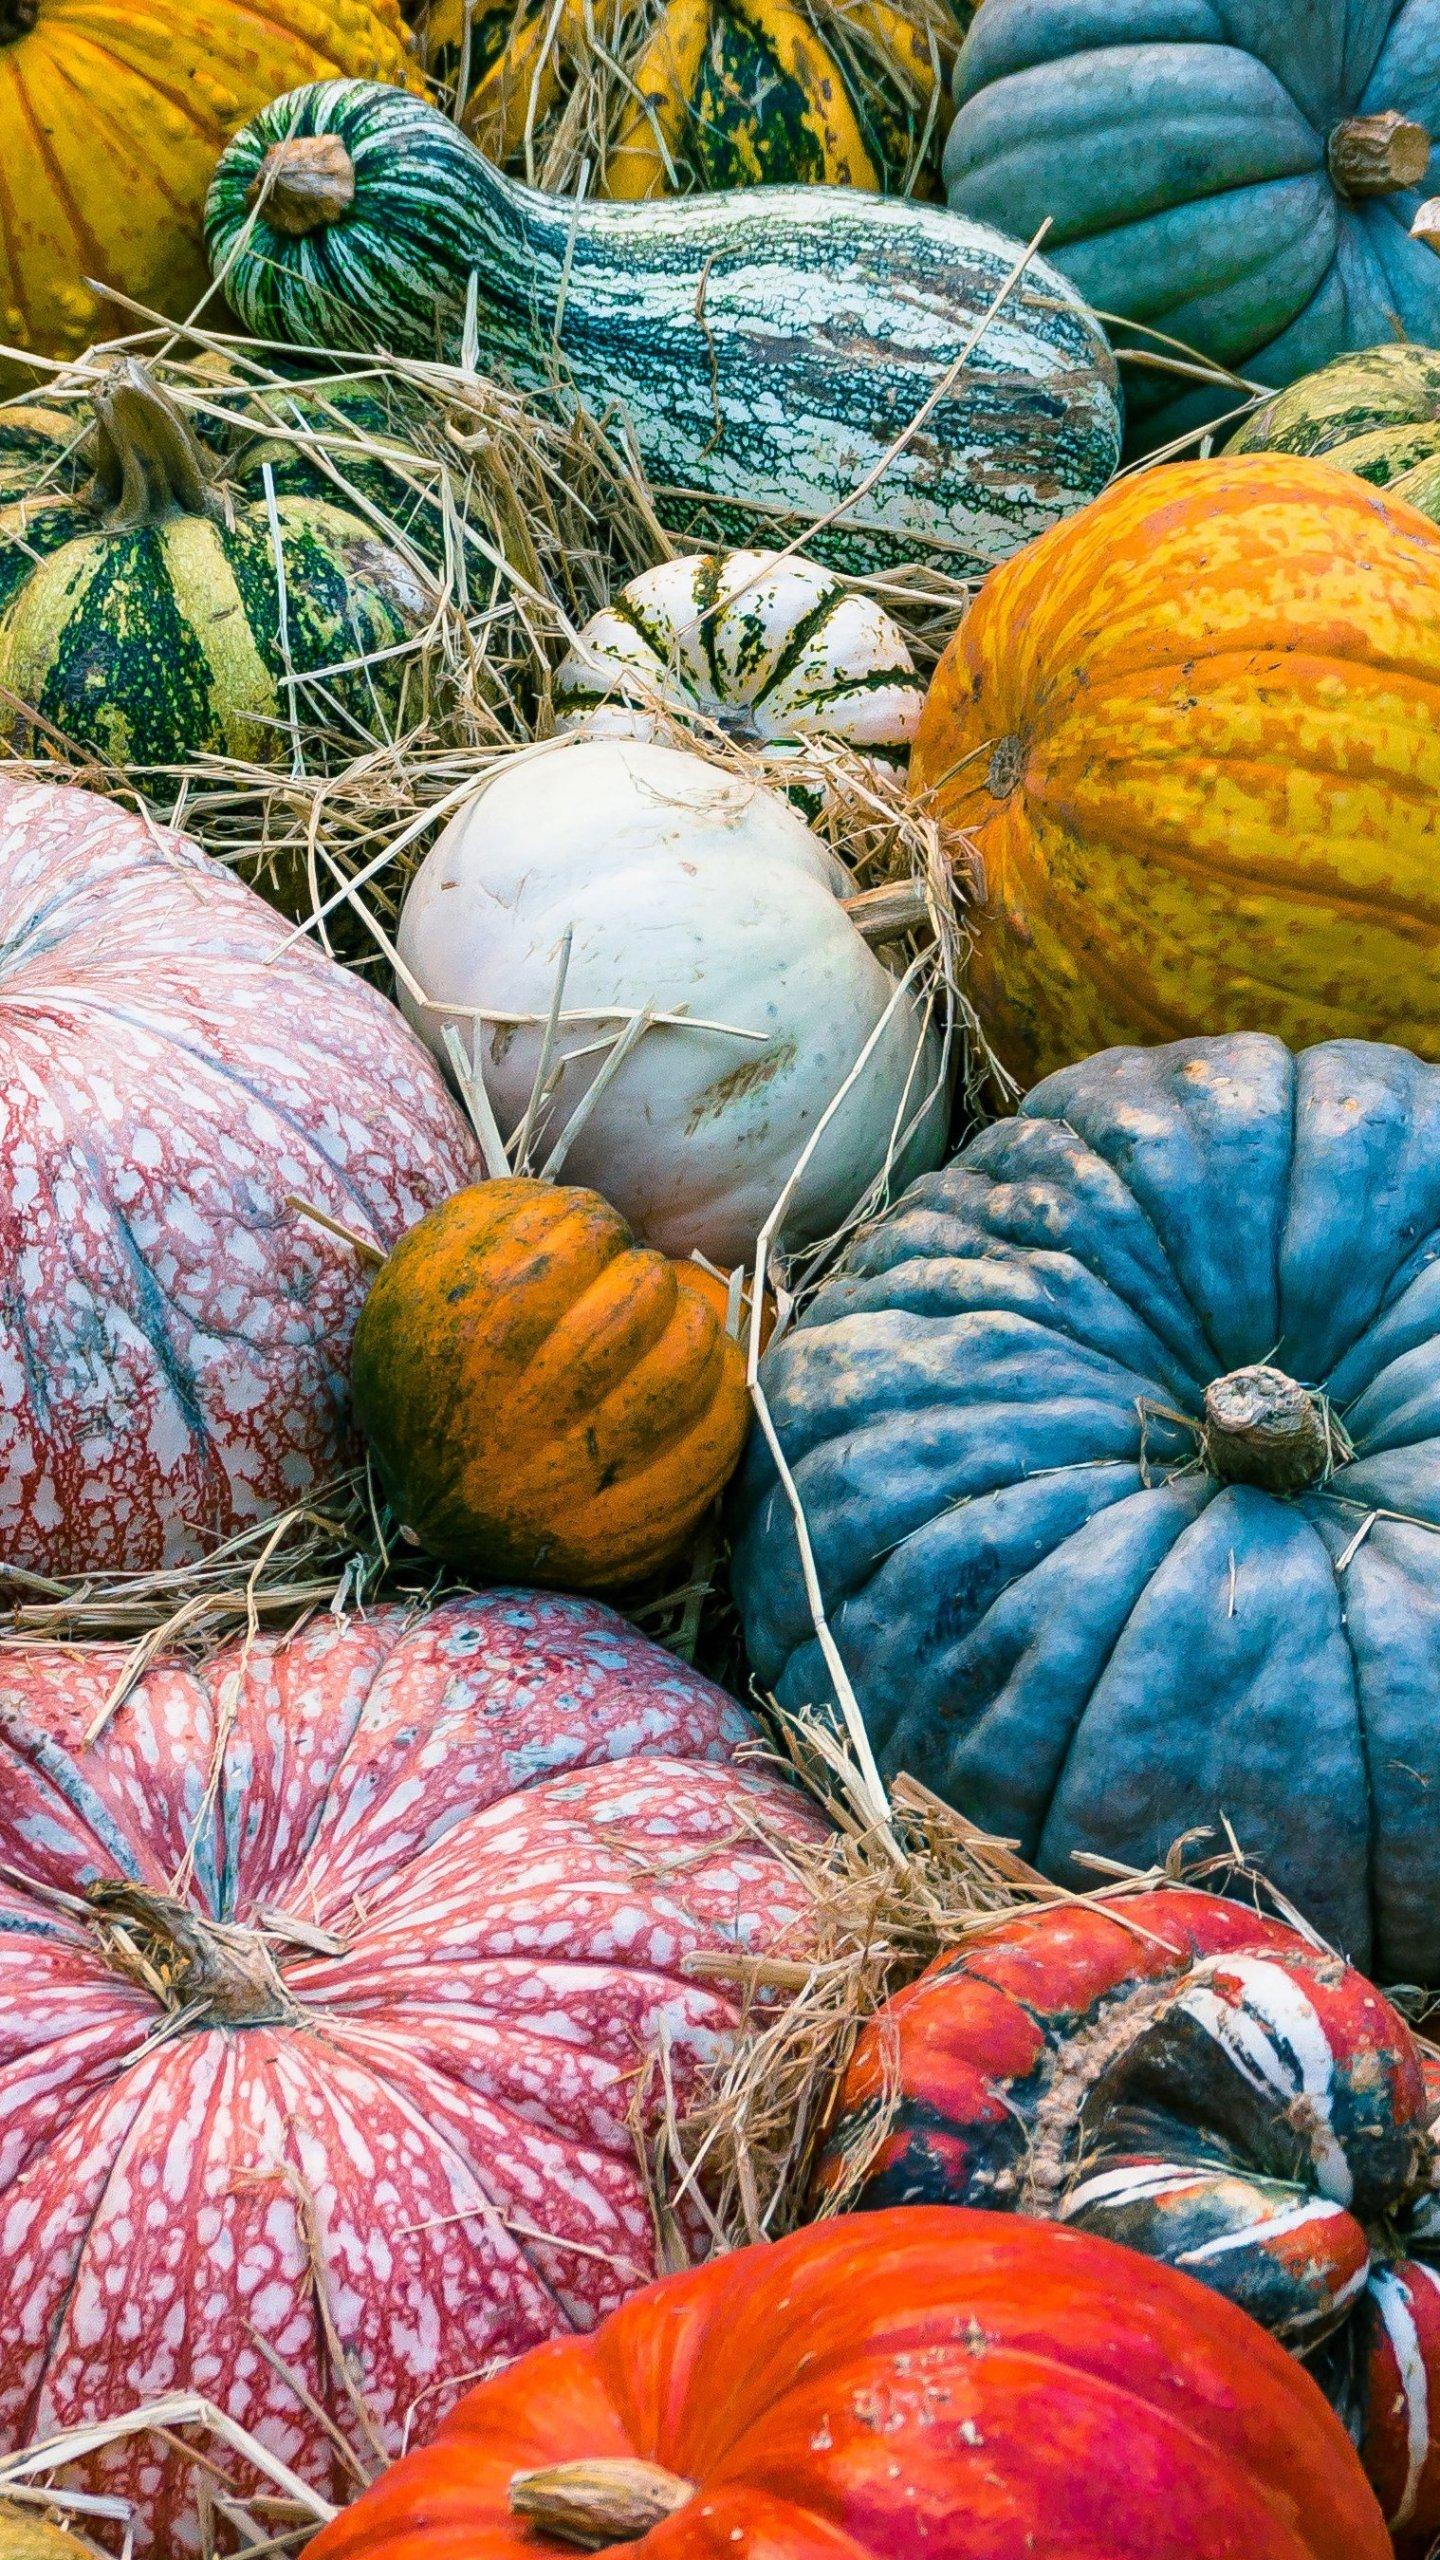 Fall Wallpaper For Android Tablet Colorful Pumpkins Autumn Wallpaper Mobile Amp Desktop